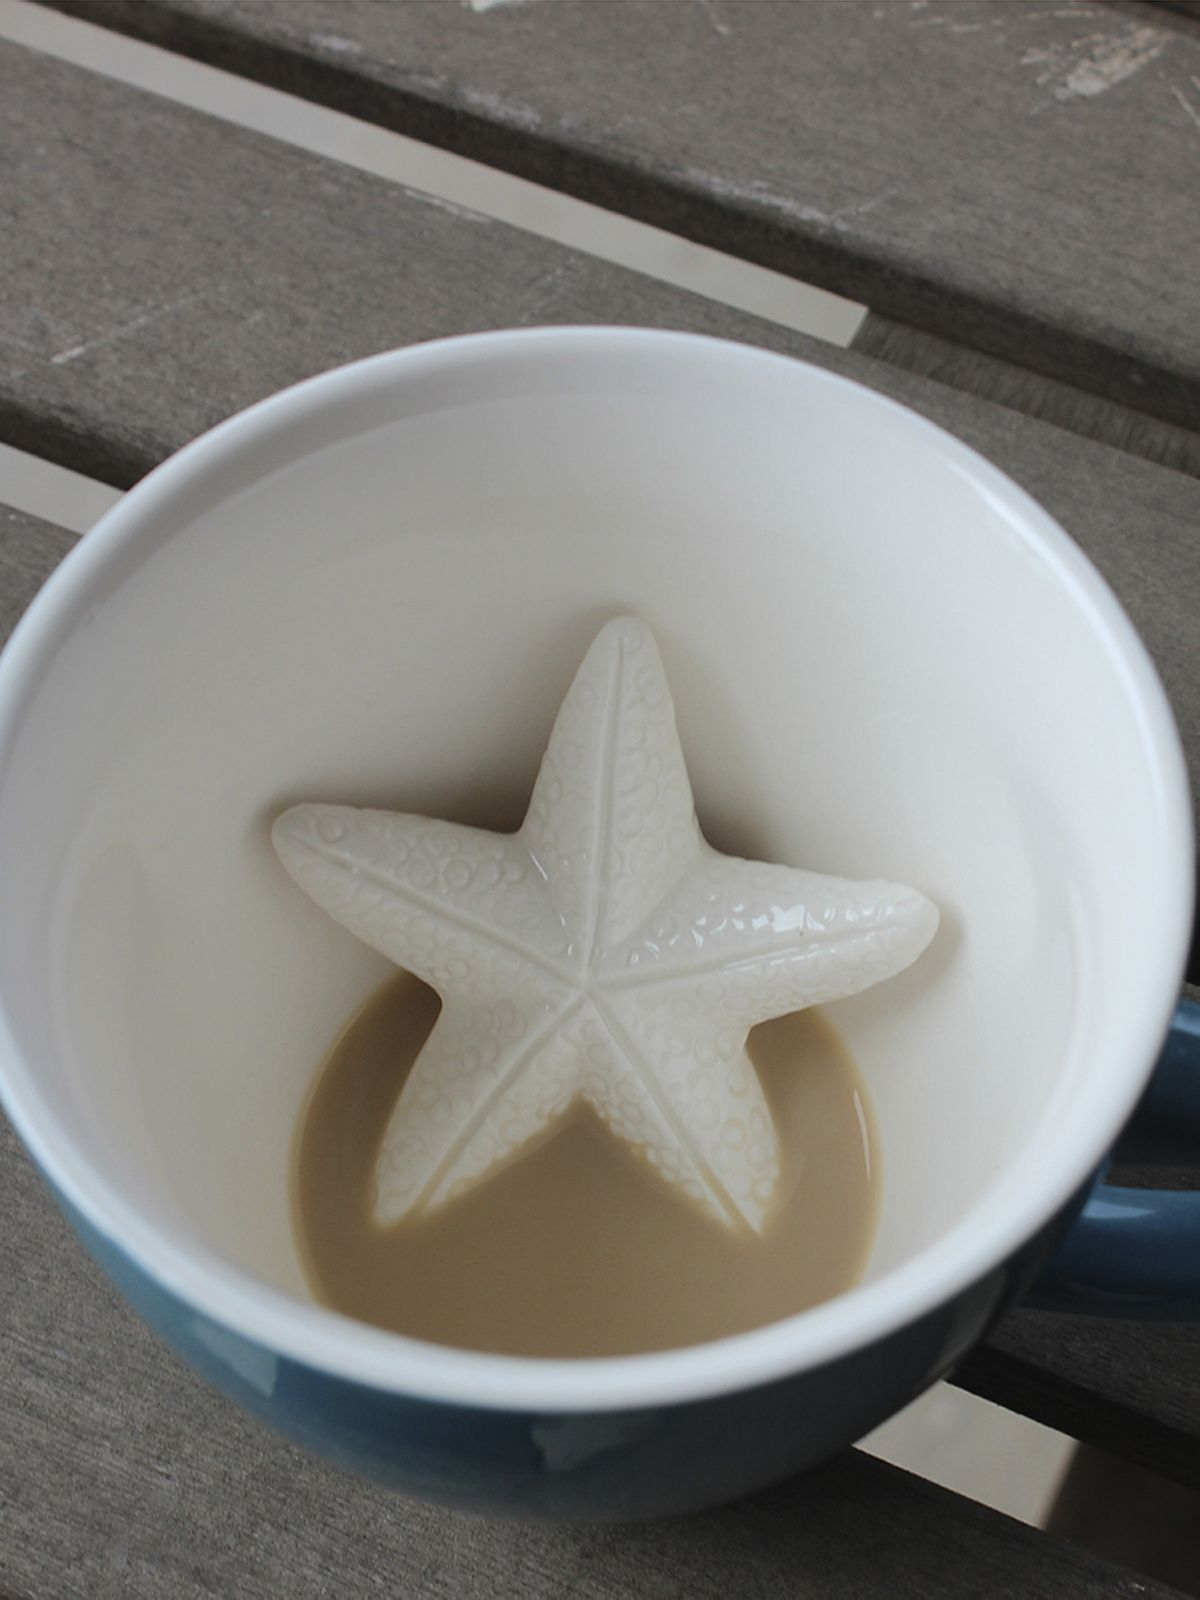 Пинкл (Pinkl) | Кружка с морской звездой | Creature Cups Starfish